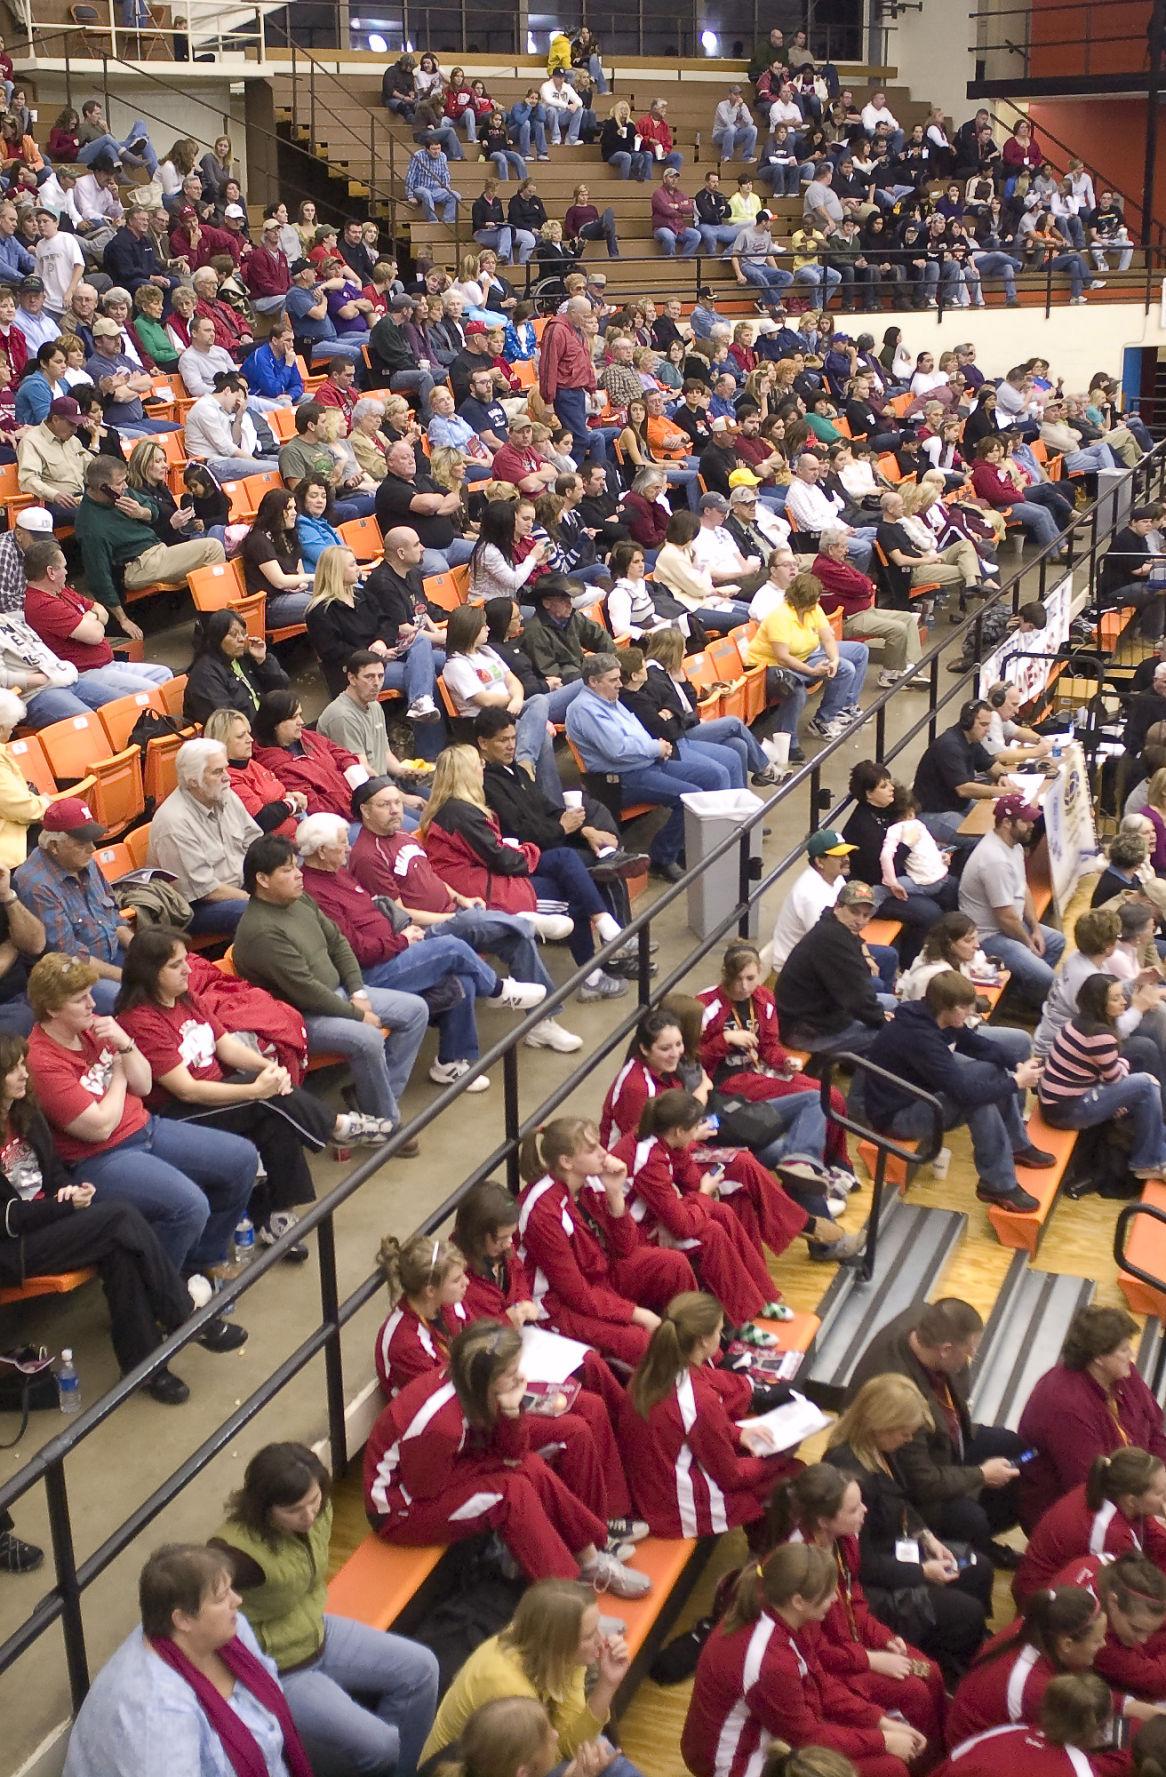 12-21 mid-america crowd.jpg